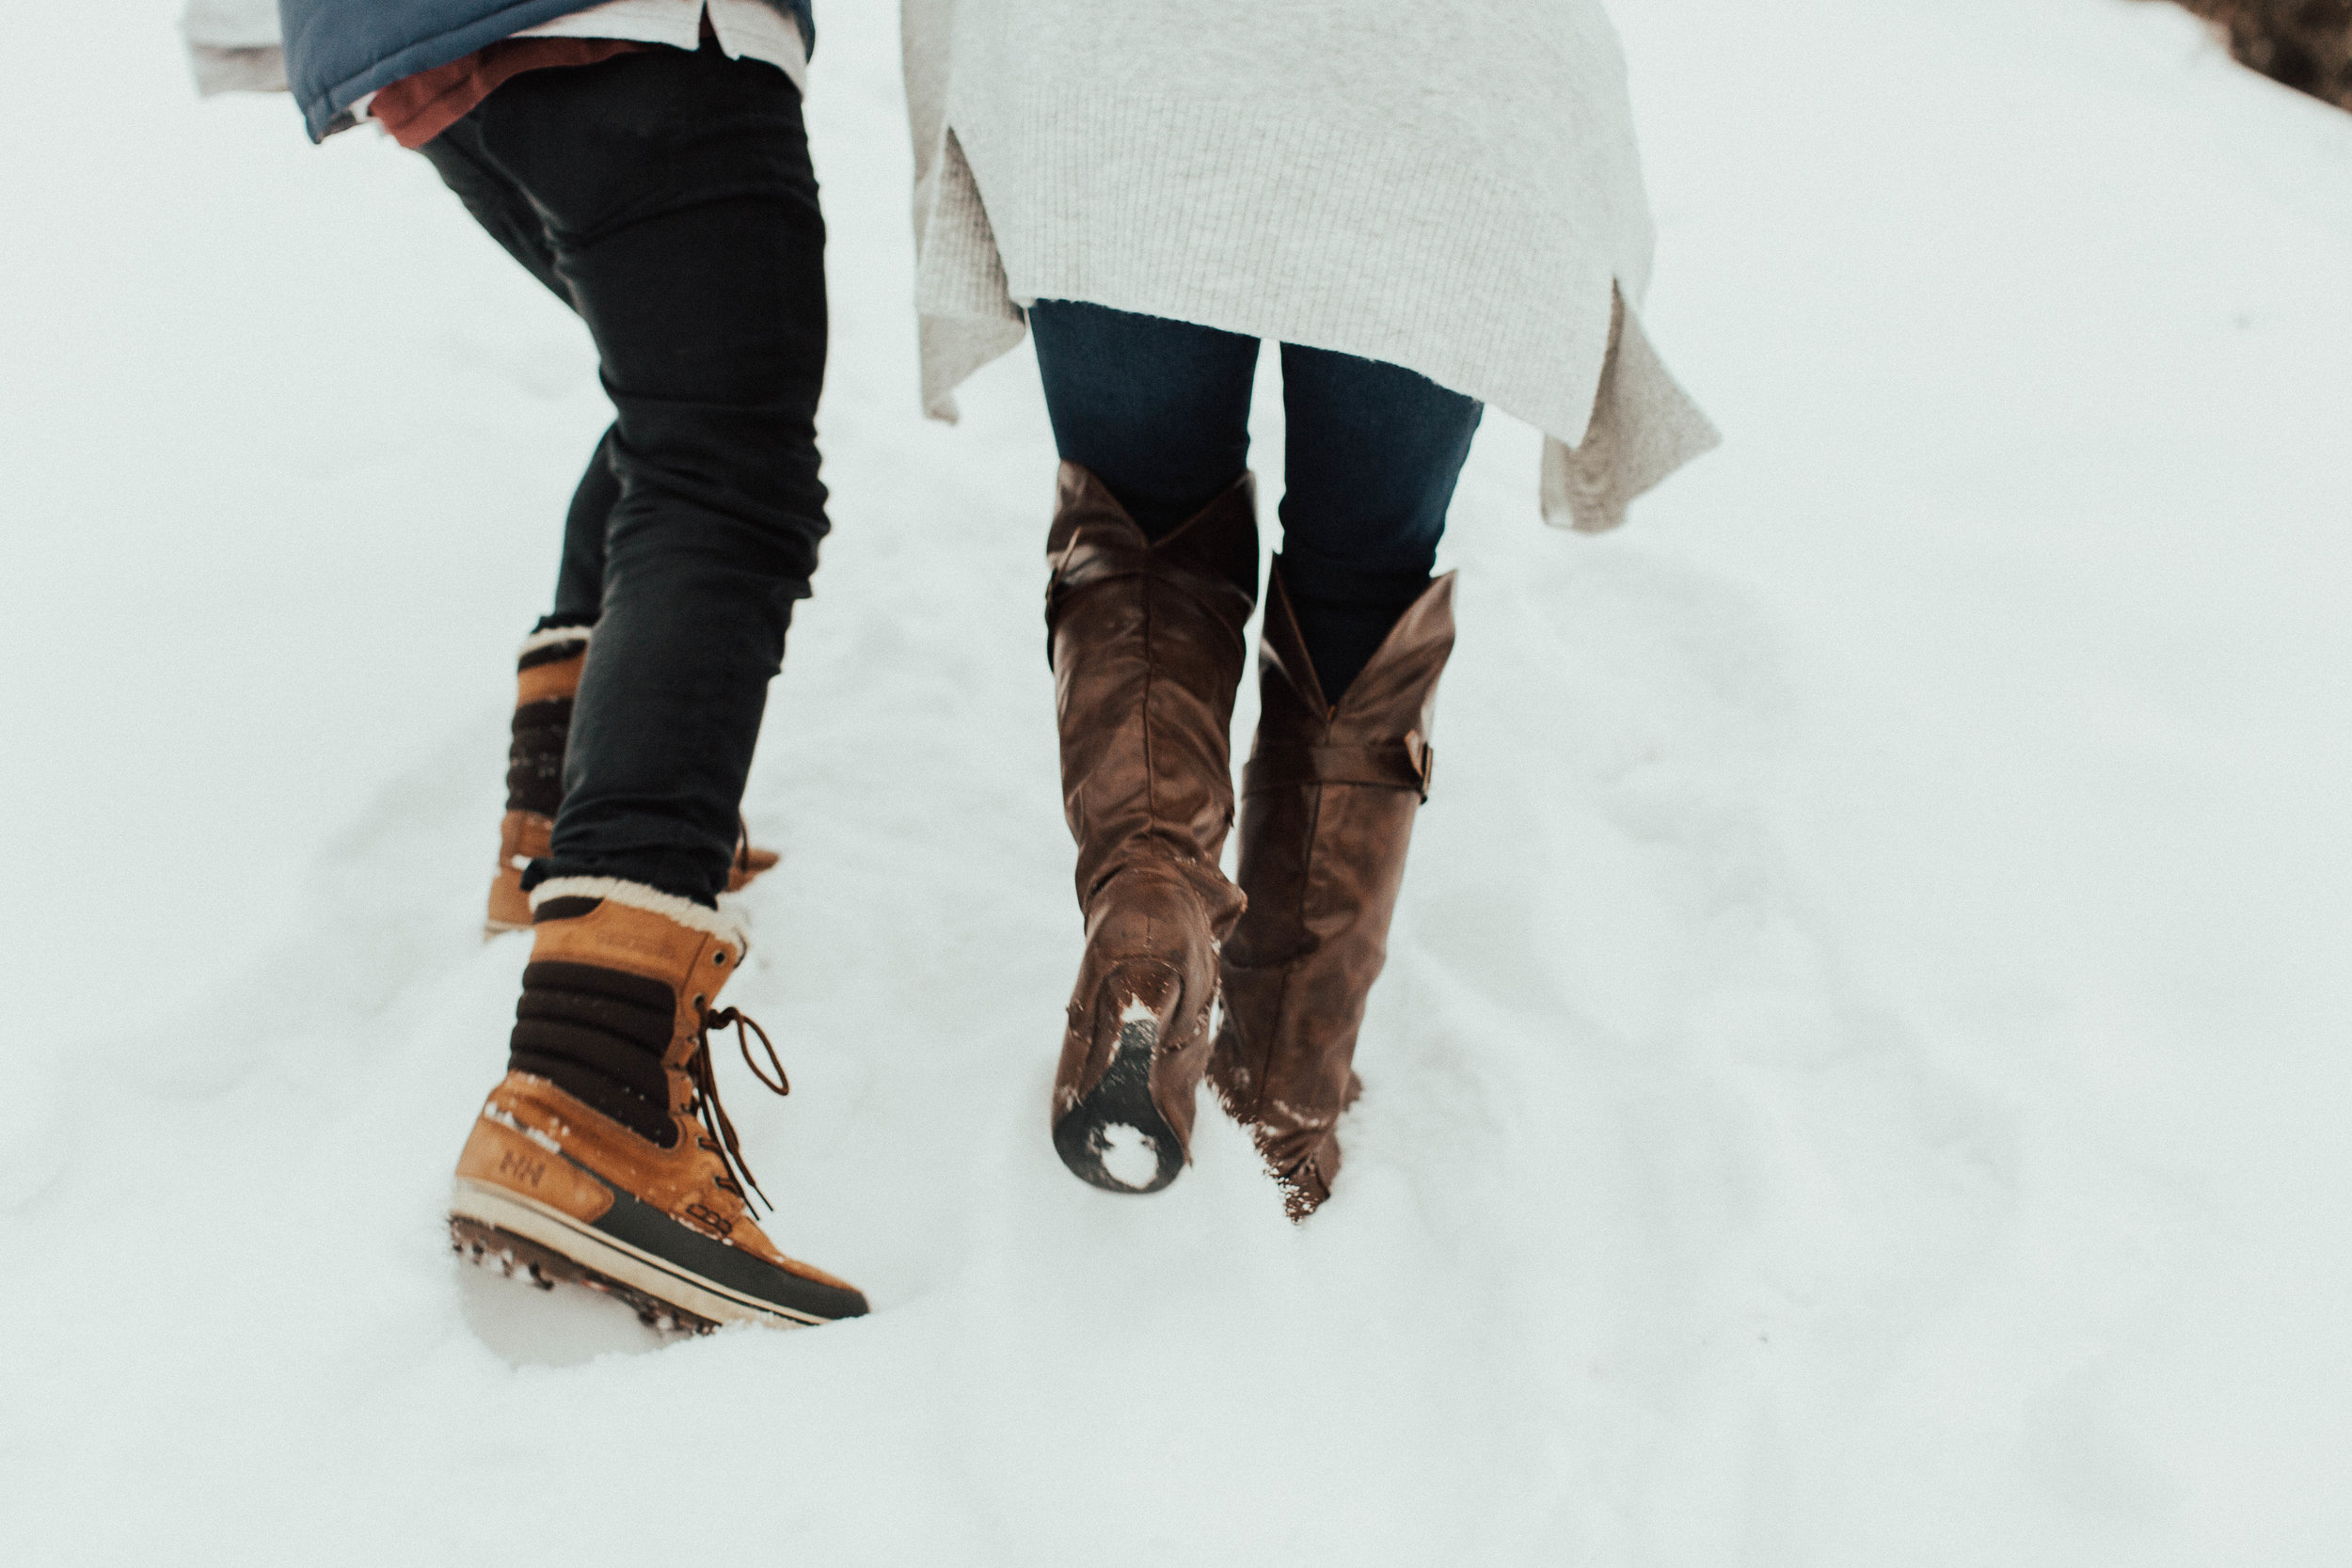 Banff Engagement Photographer - Winter Mountain Adventure Engagement Session - Michelle Larmand Photography-021